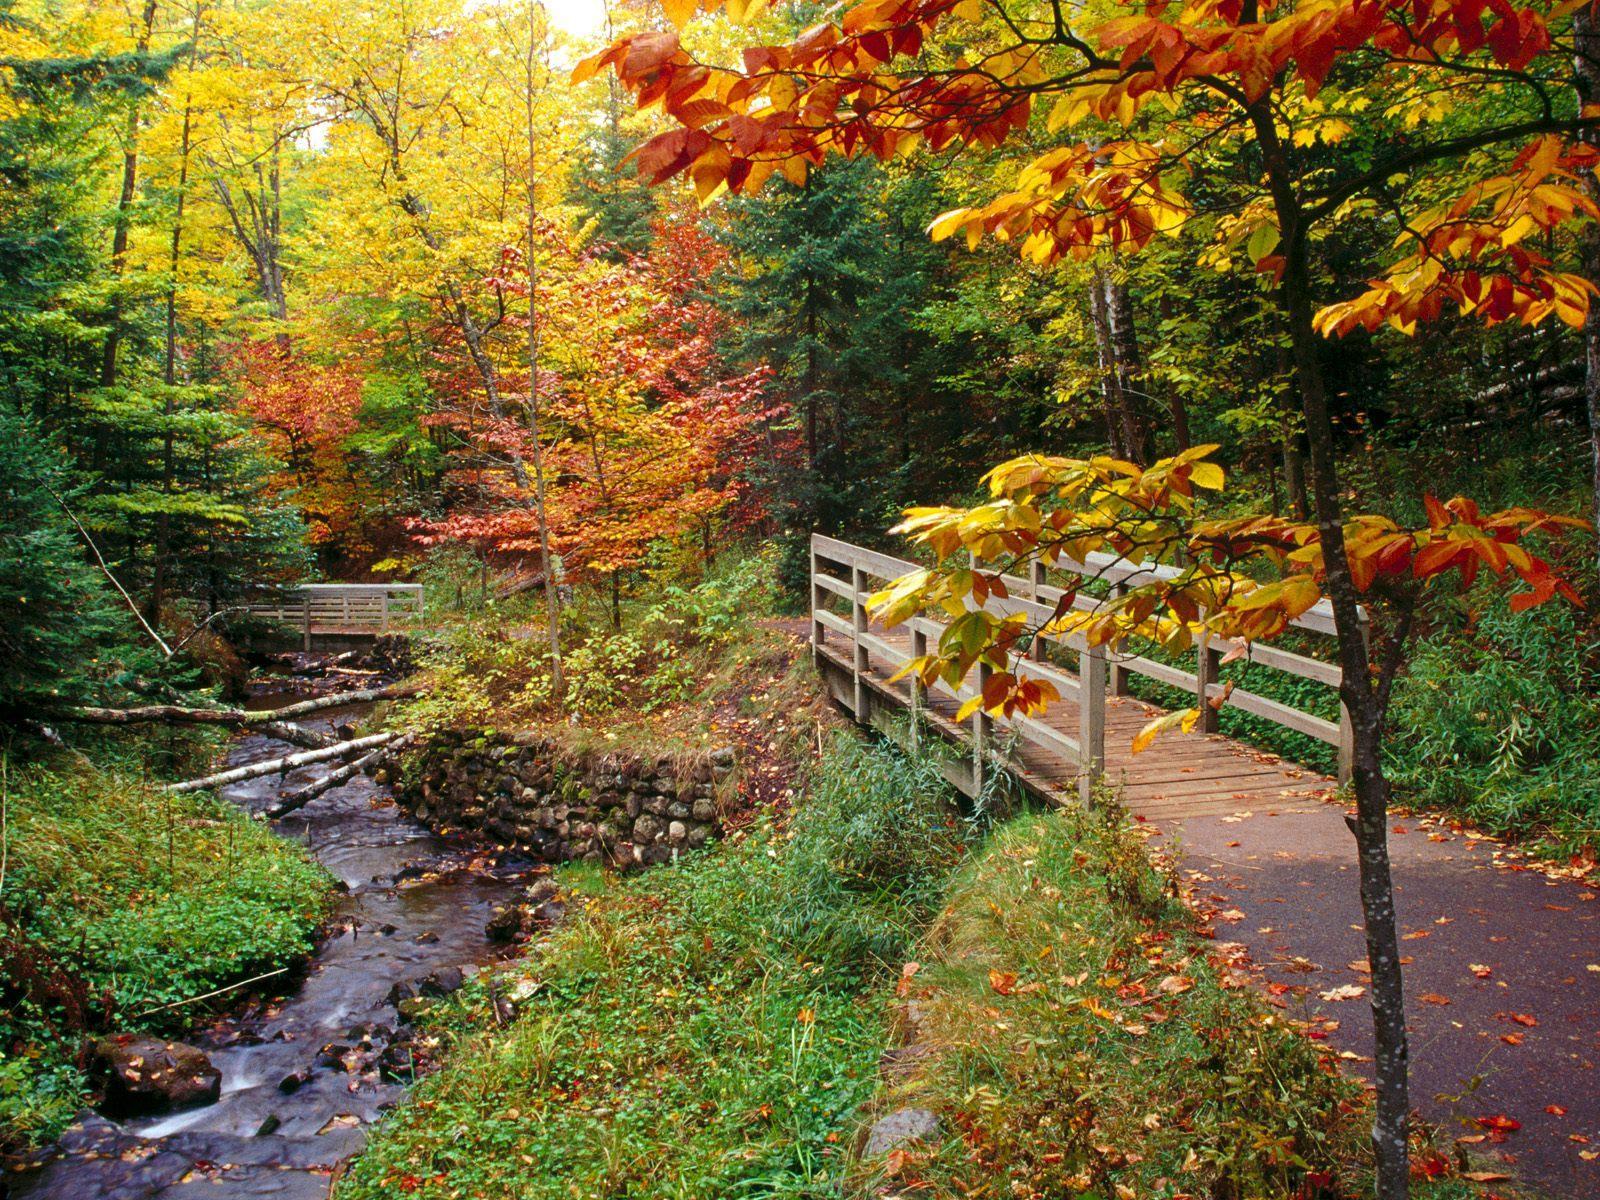 fall october autumn falls scenery pumpkin colors